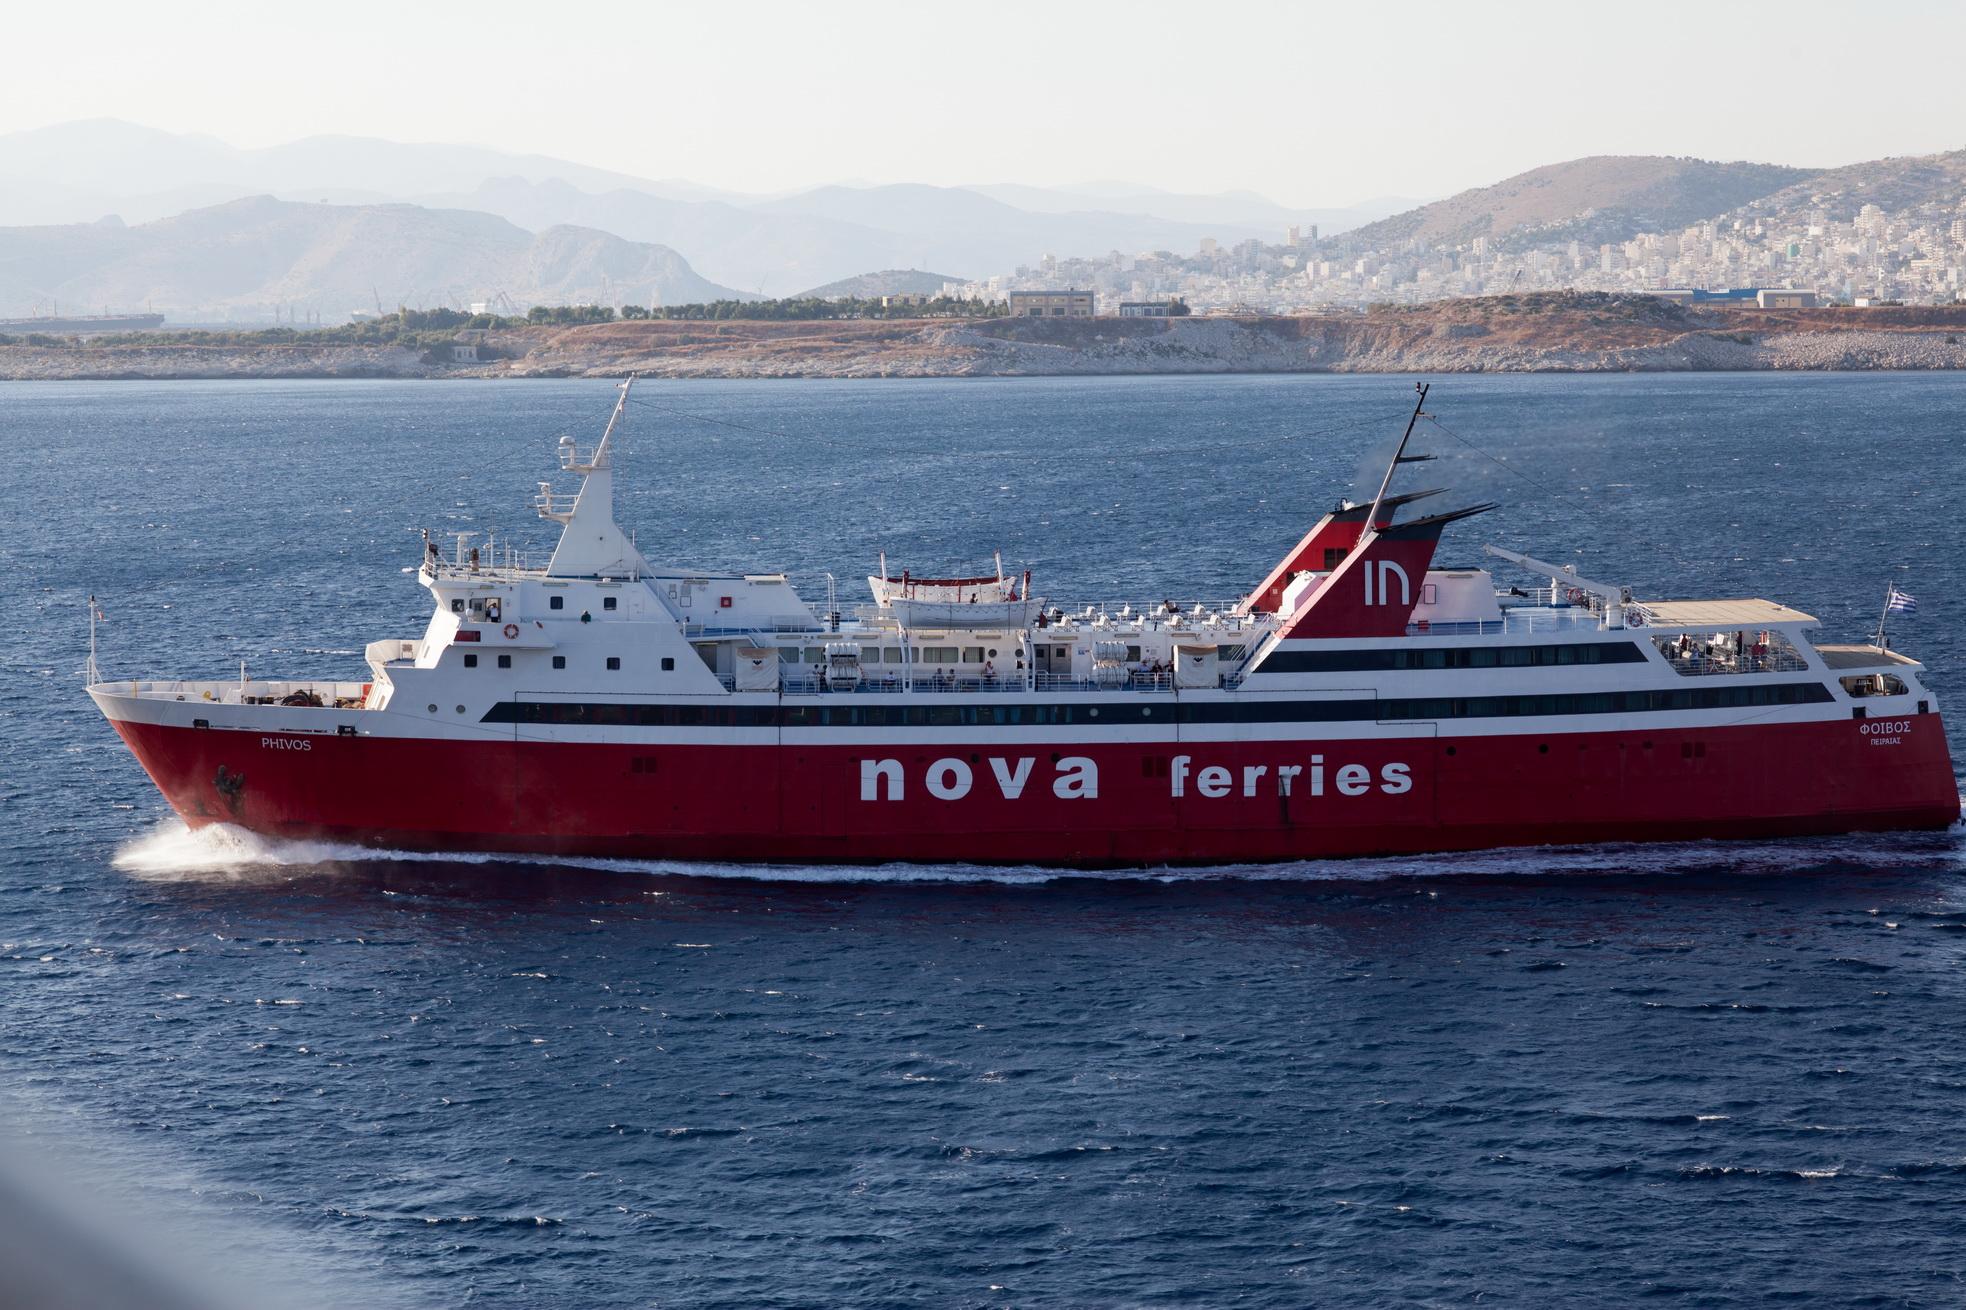 MS Phivos IMO 7825978 Nova Ferries leaving Piraeus Port of Athens Greece 06